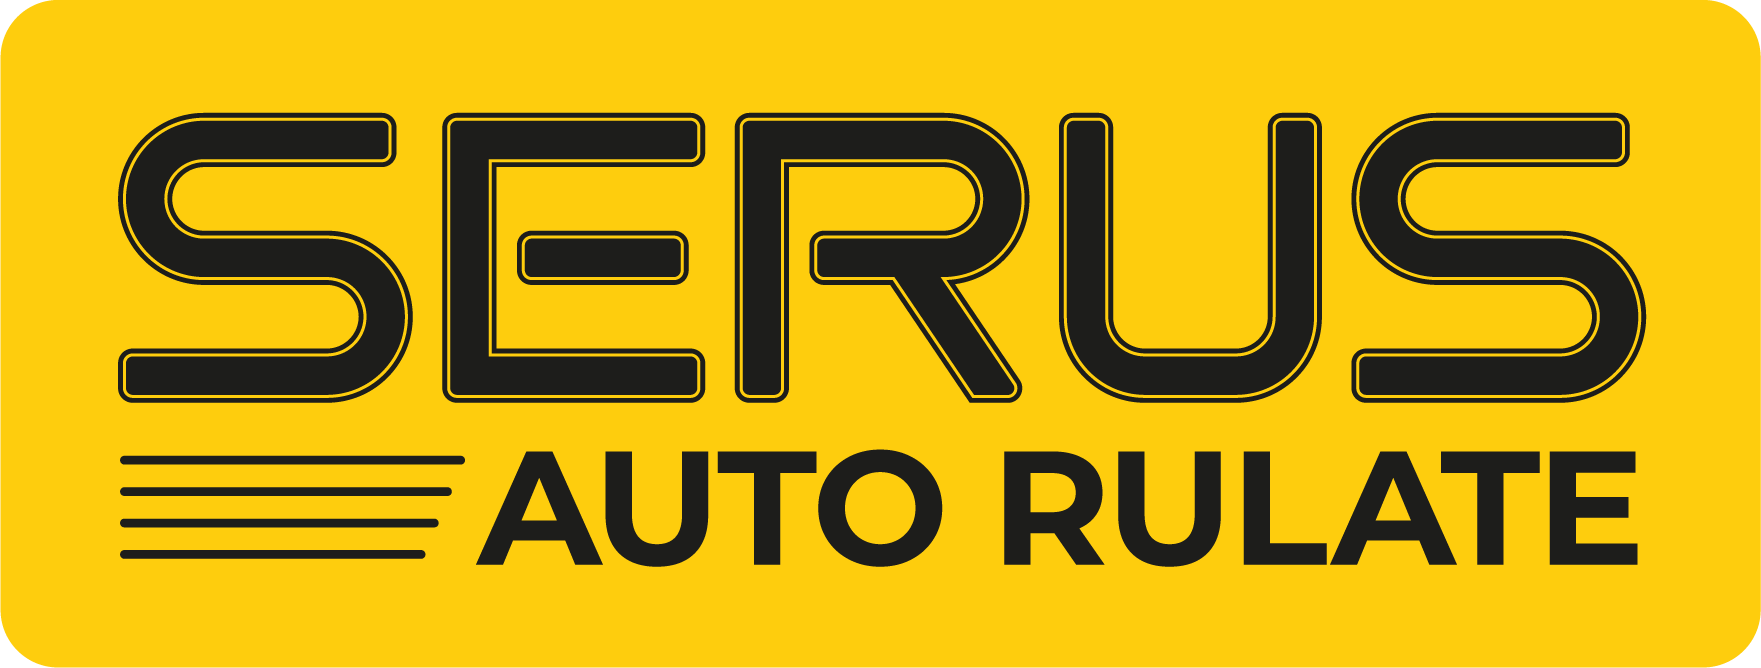 SERUS auto rulate